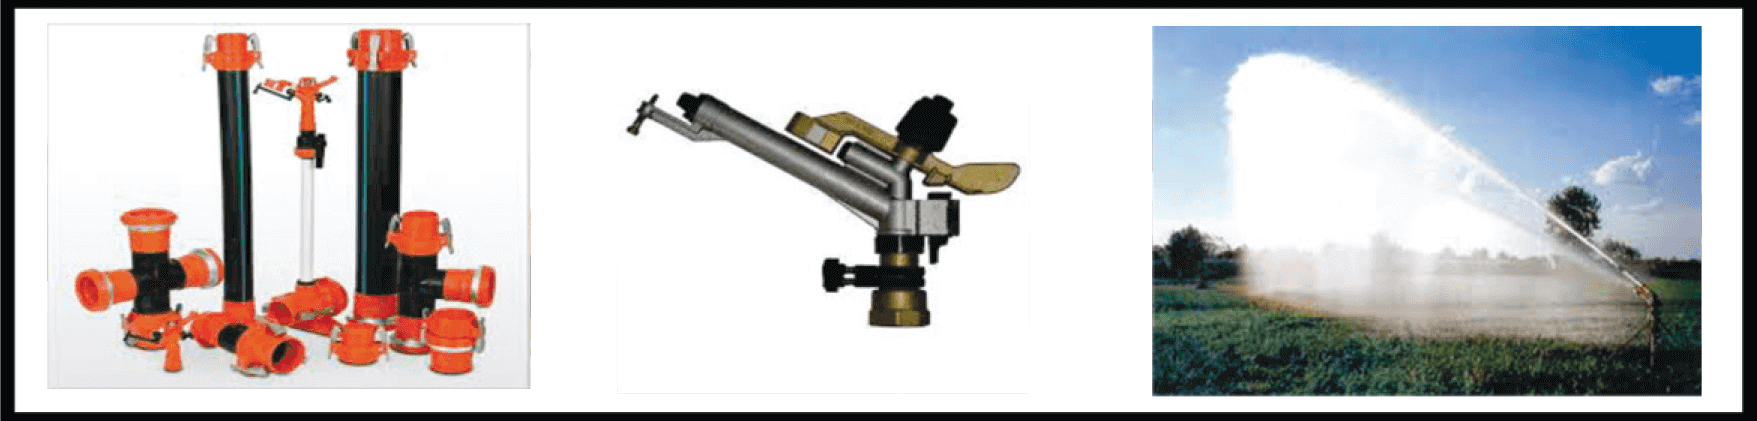 Agricultural irrigation - tarlasuvarma 0000 Layer 1 - Agricultural irrigation